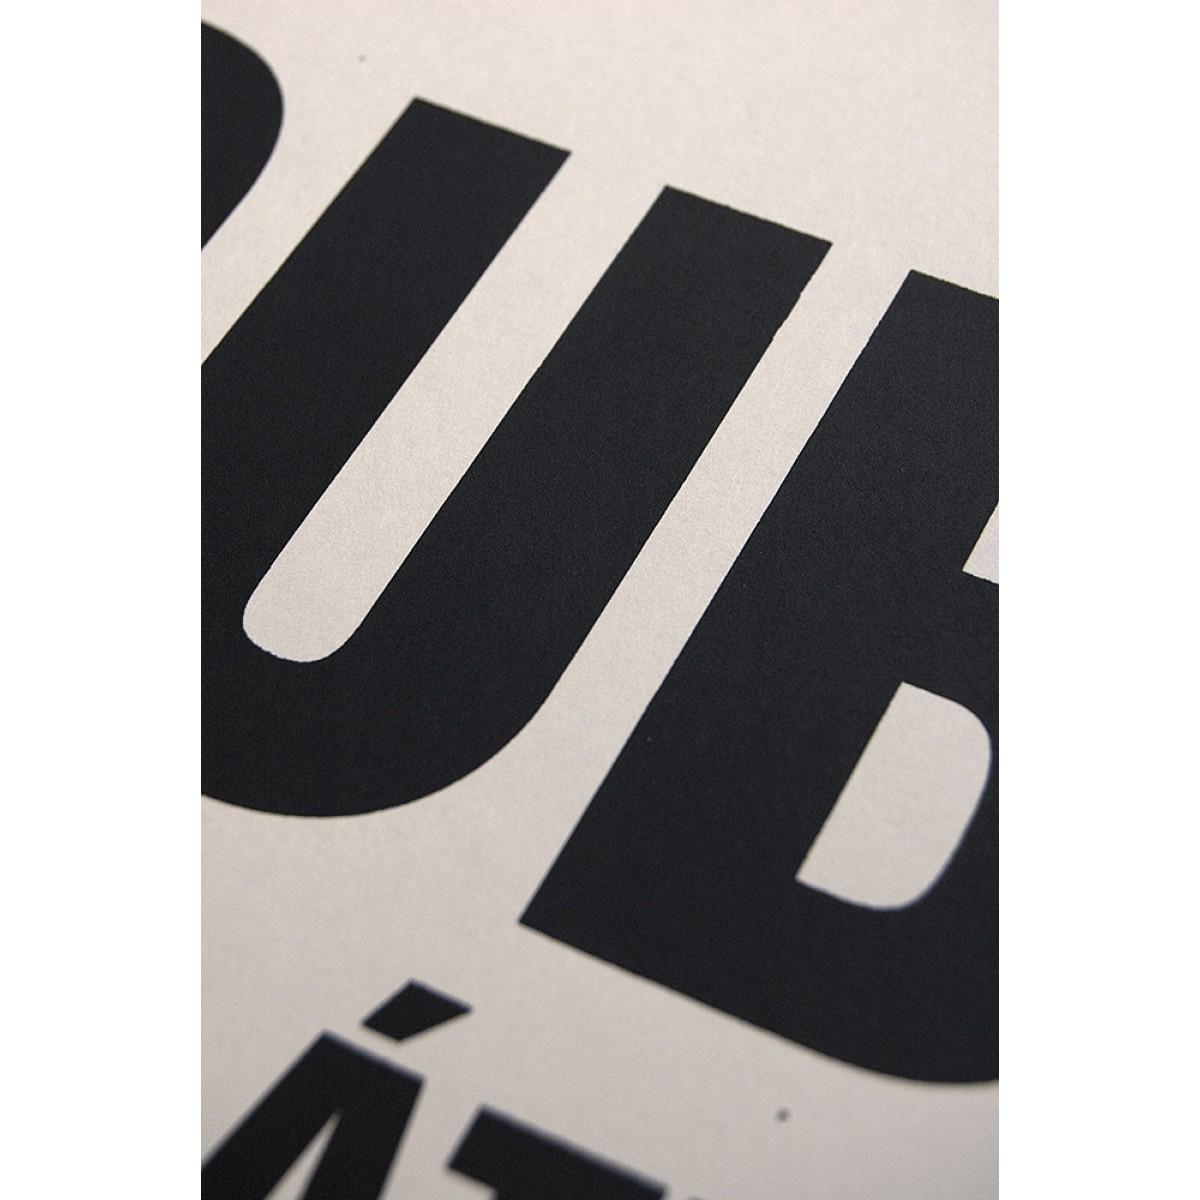 Buchstabenort Dublin Stadtteile-Poster Typografie